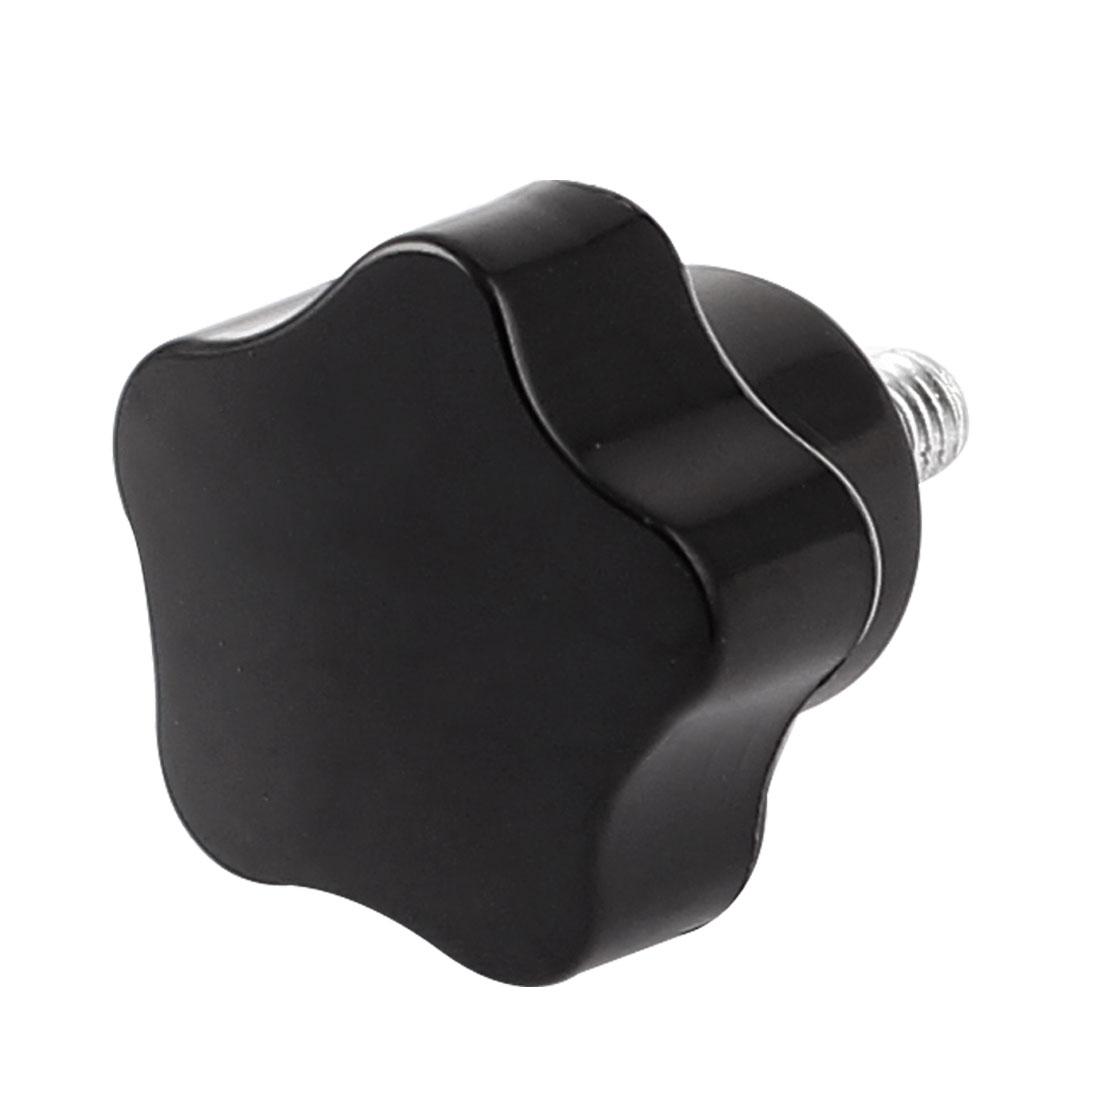 M5 x 10mm Male Thread Star Head Clamping Knob Black